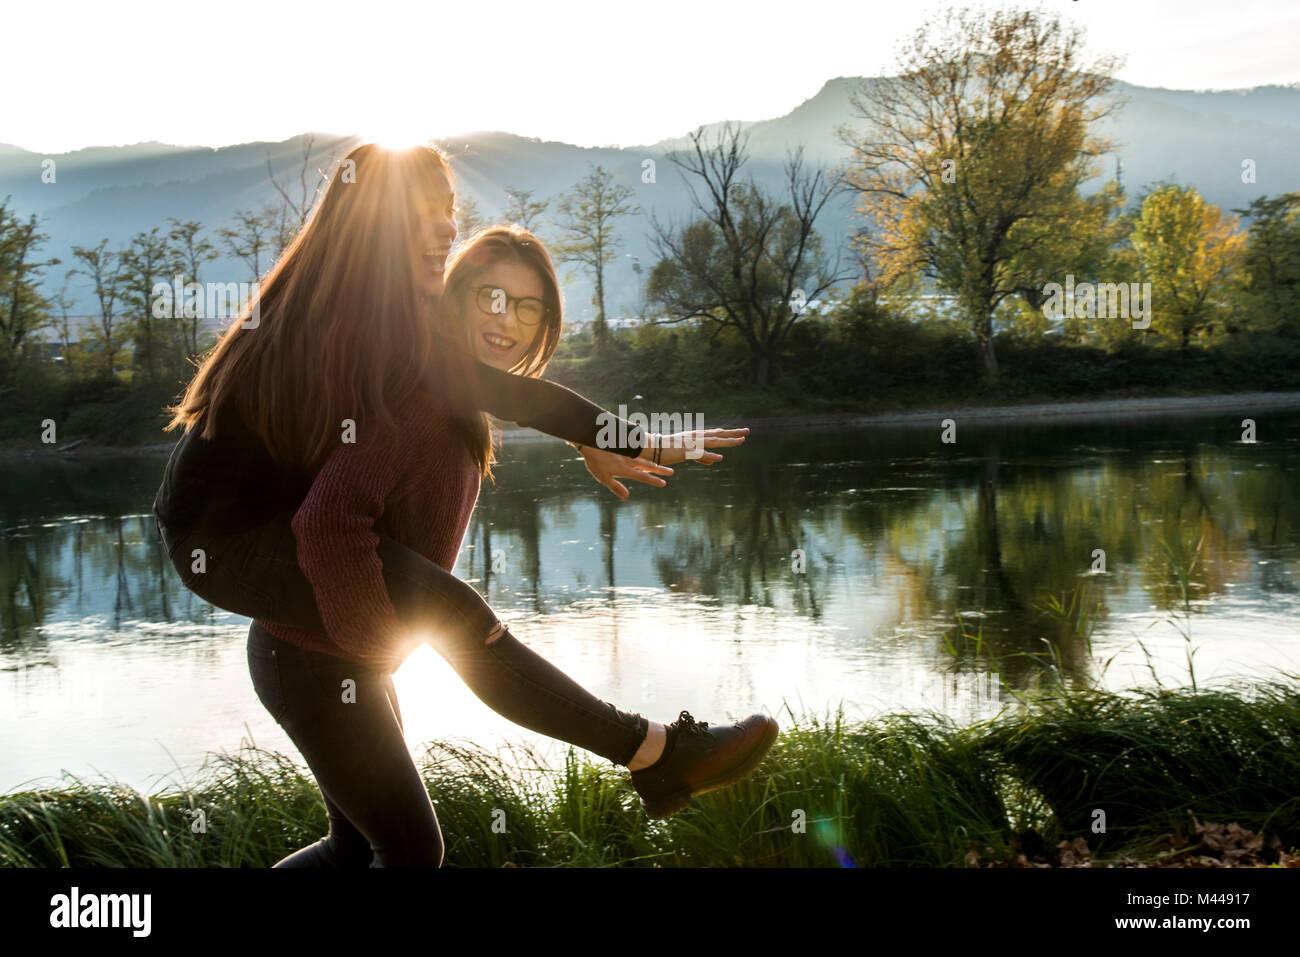 Junge Frau bester Freund Huckepack gebend am Flussufer, Calolziocorte, Lombardei, Italien Stockbild